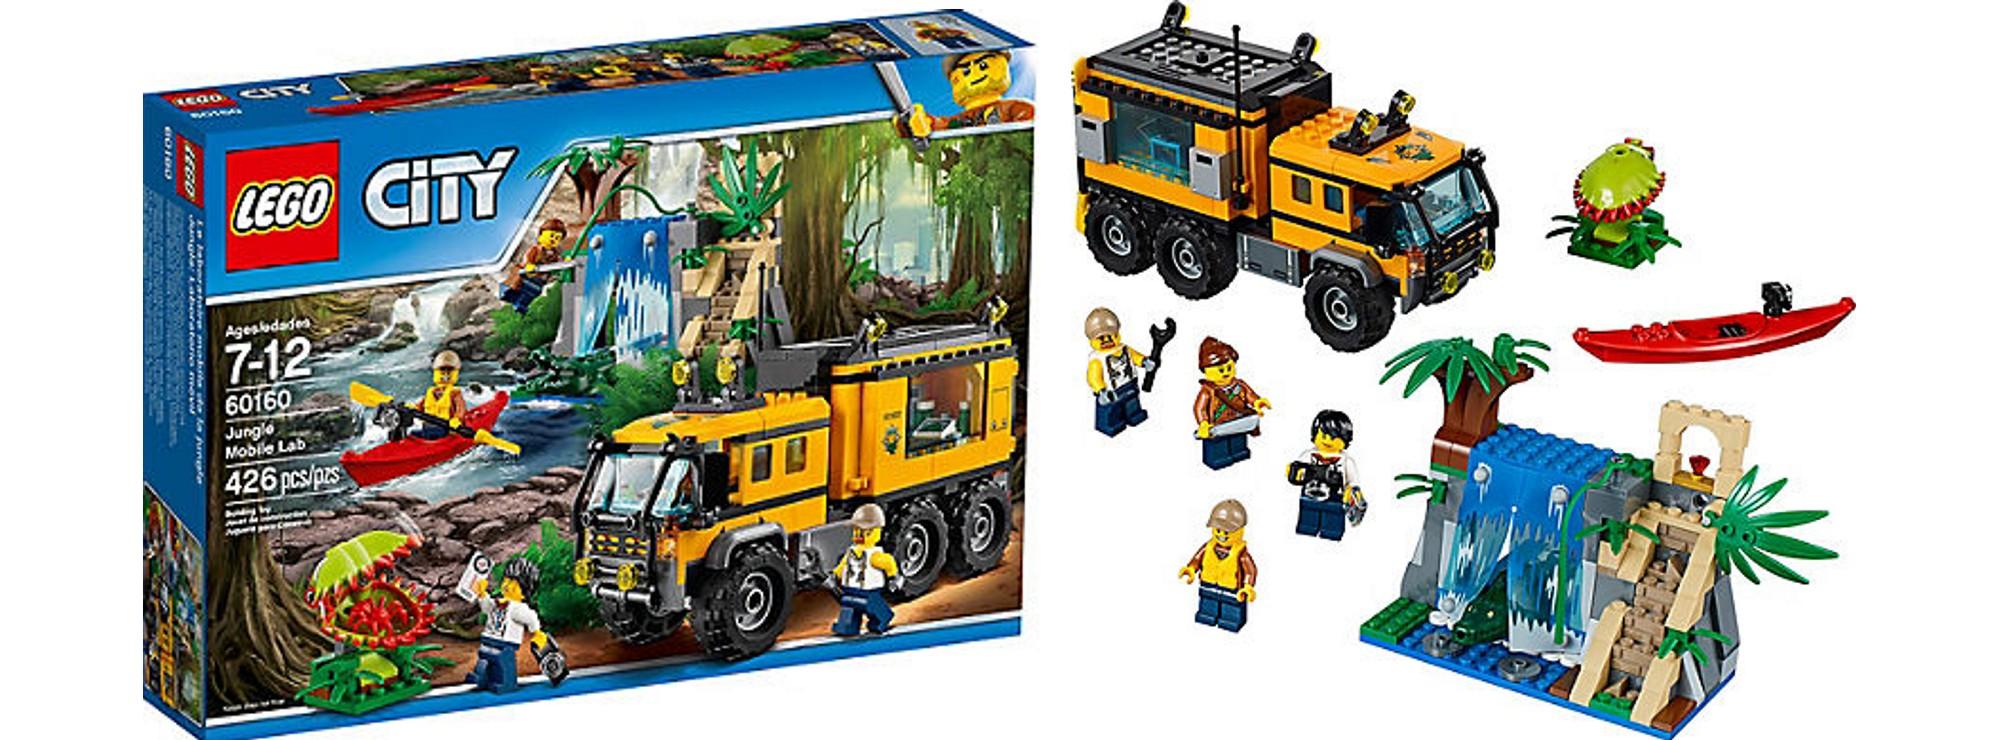 An Ab 7 Jahre Labor Mobile Lego City 60160 jungla